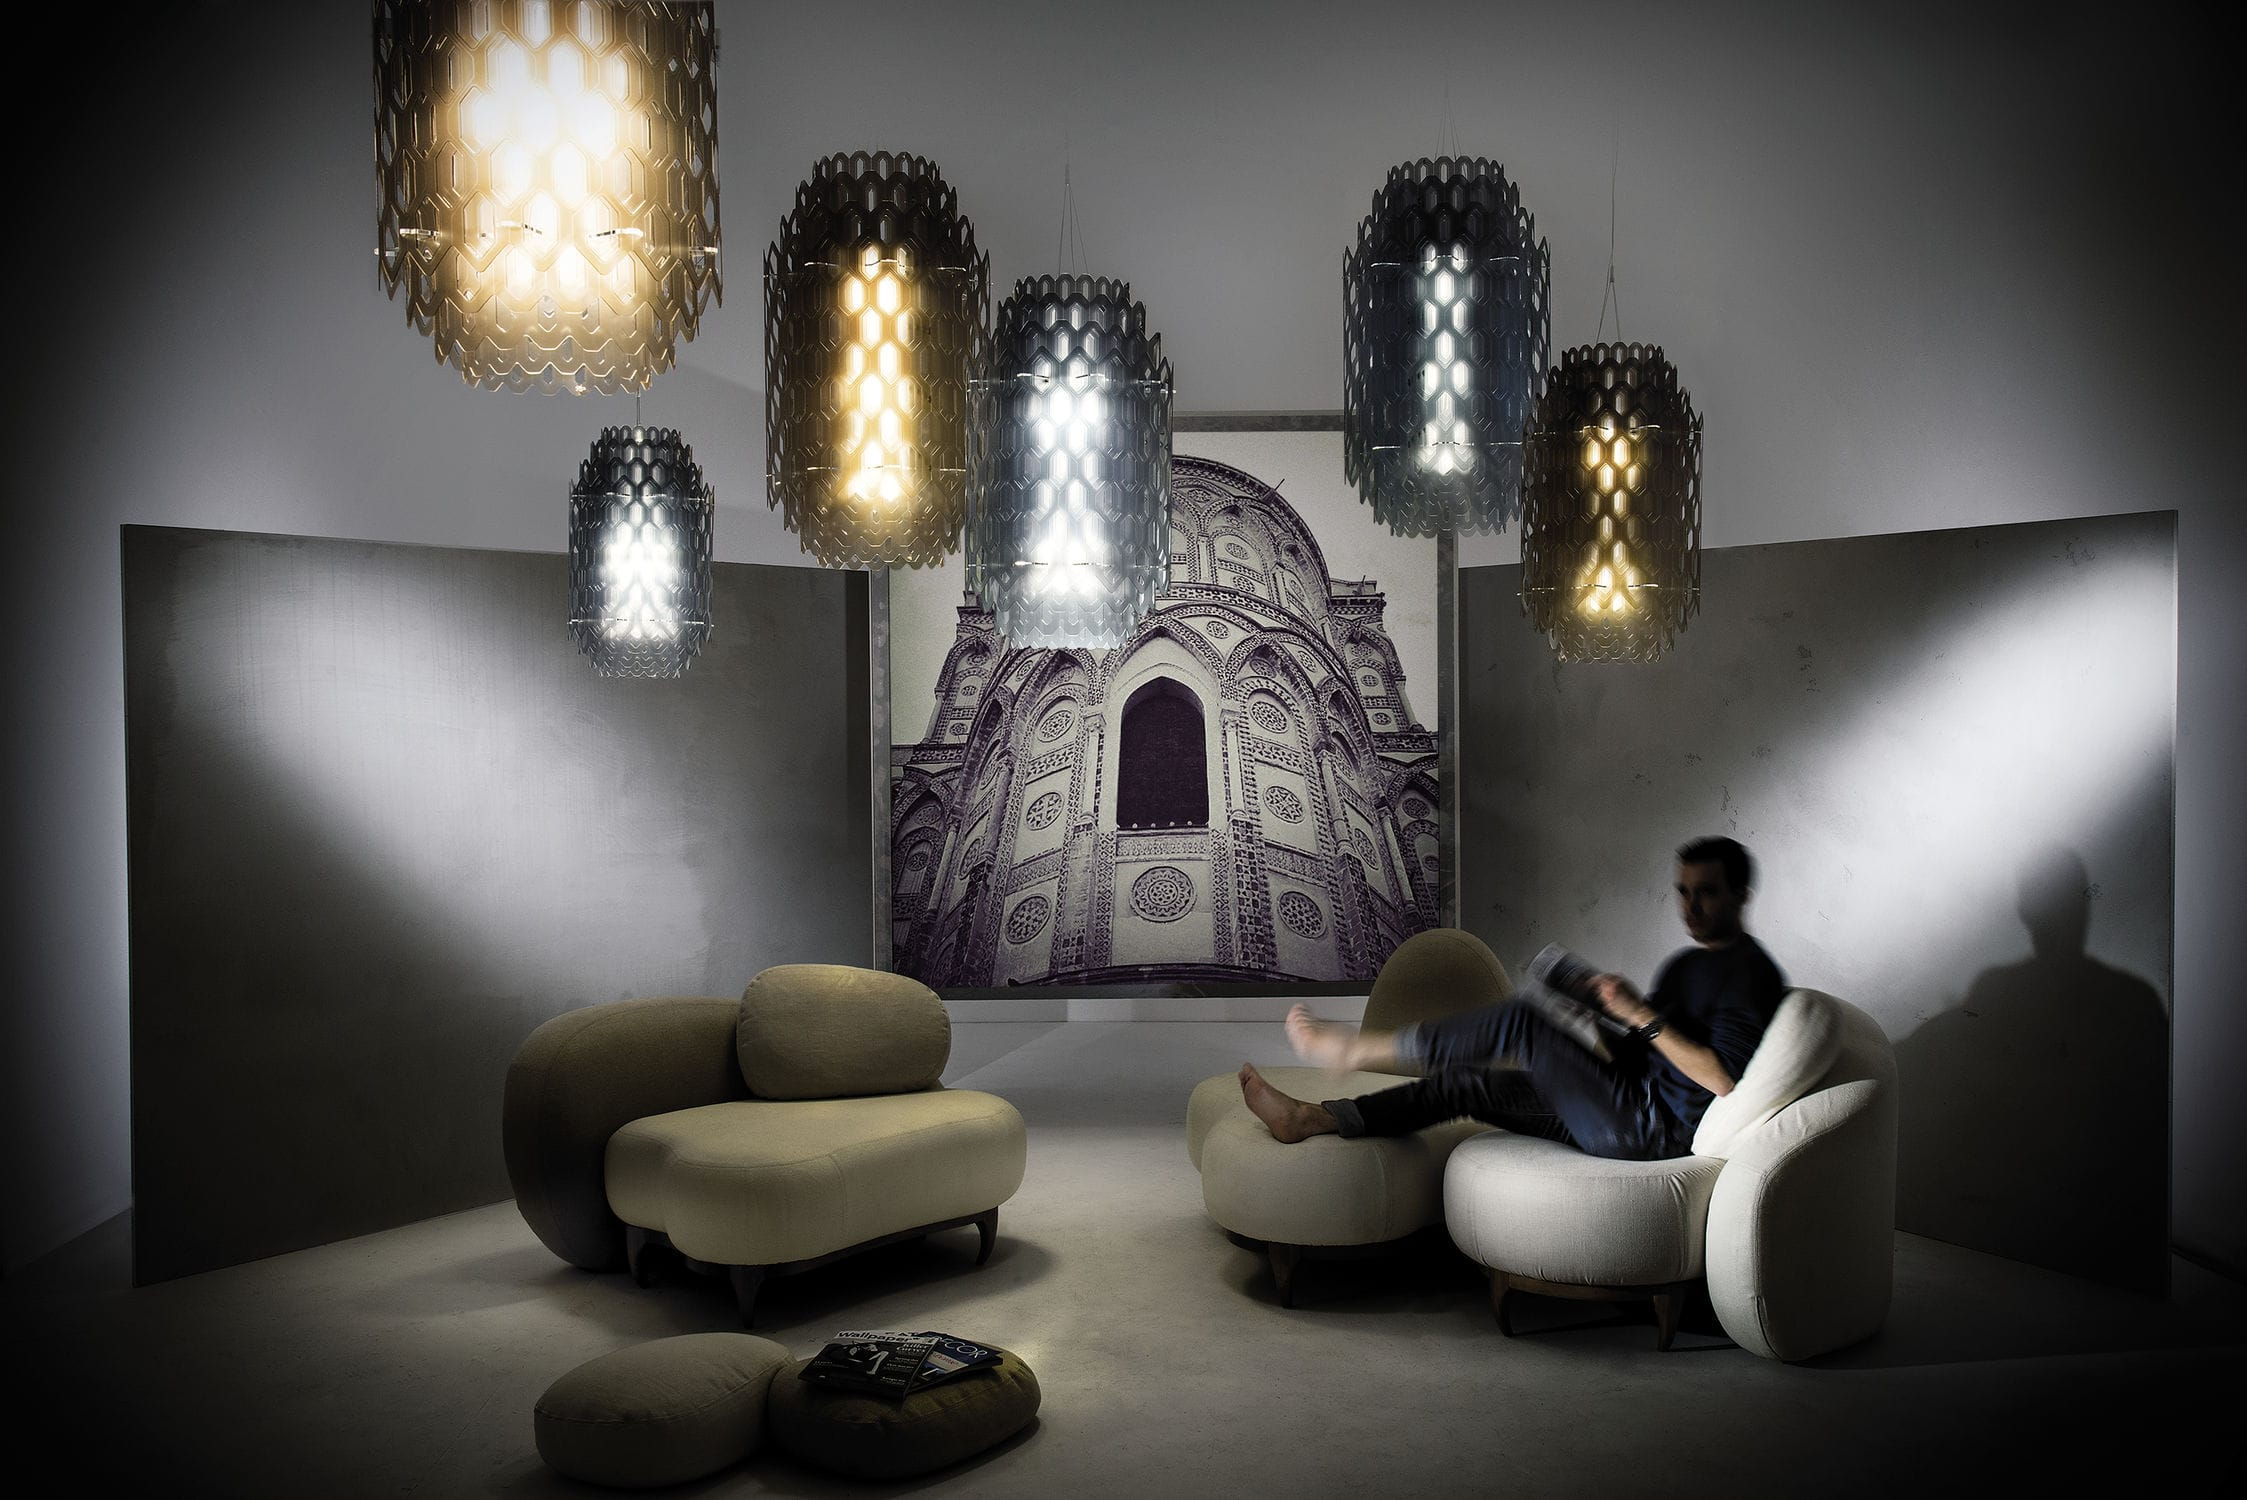 Lampadario Fiorella Slamp : Slamp flora small lampada a sospensione lampadario design lamp